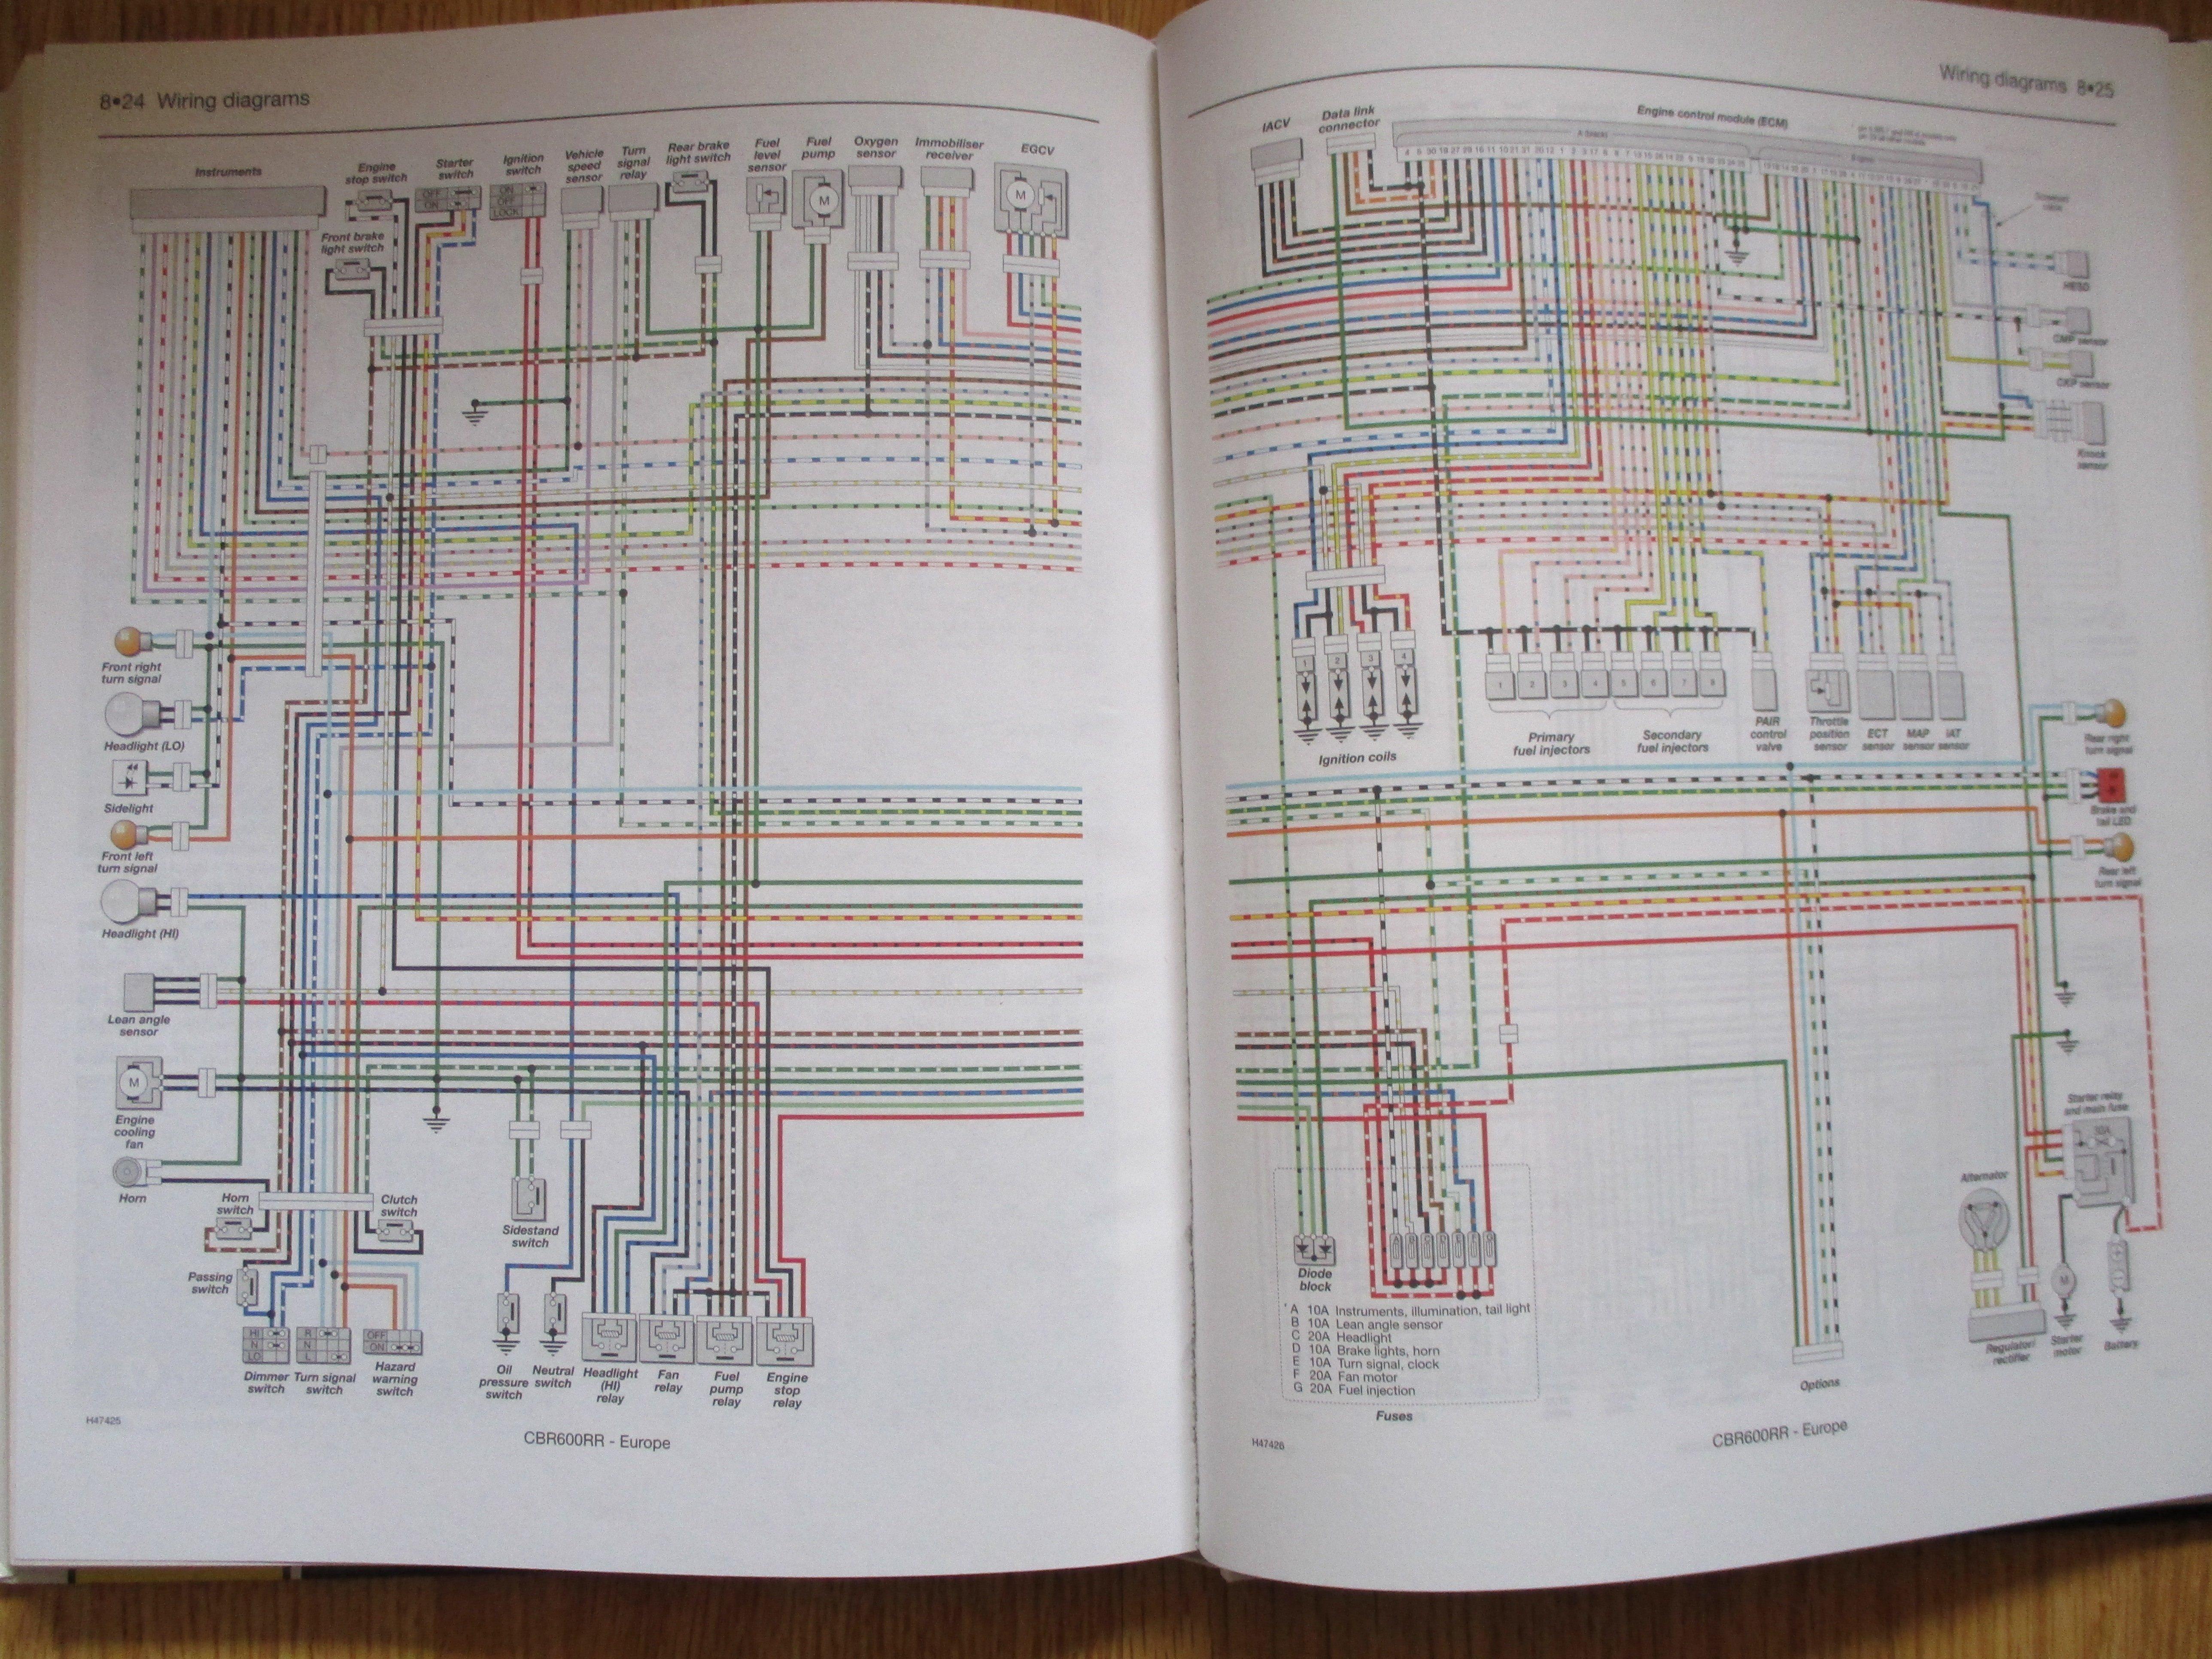 08 Cbr600rr Wiring Diagram Honda Cbr 600rr Forum